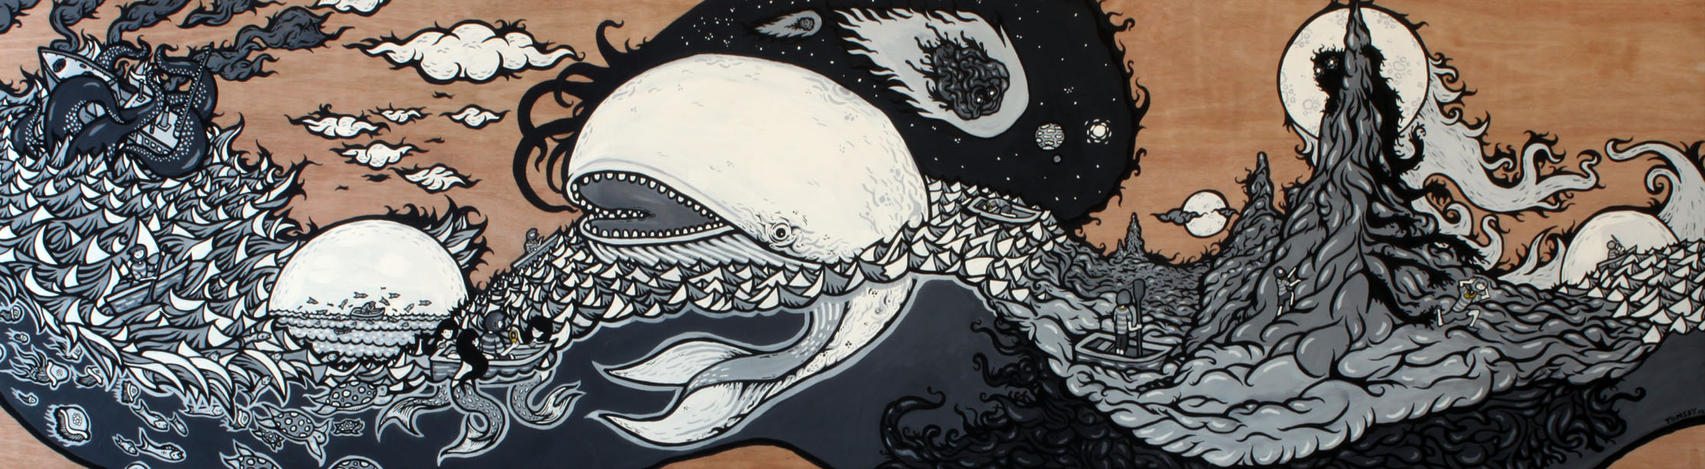 Ocean Adventure by mtomsky